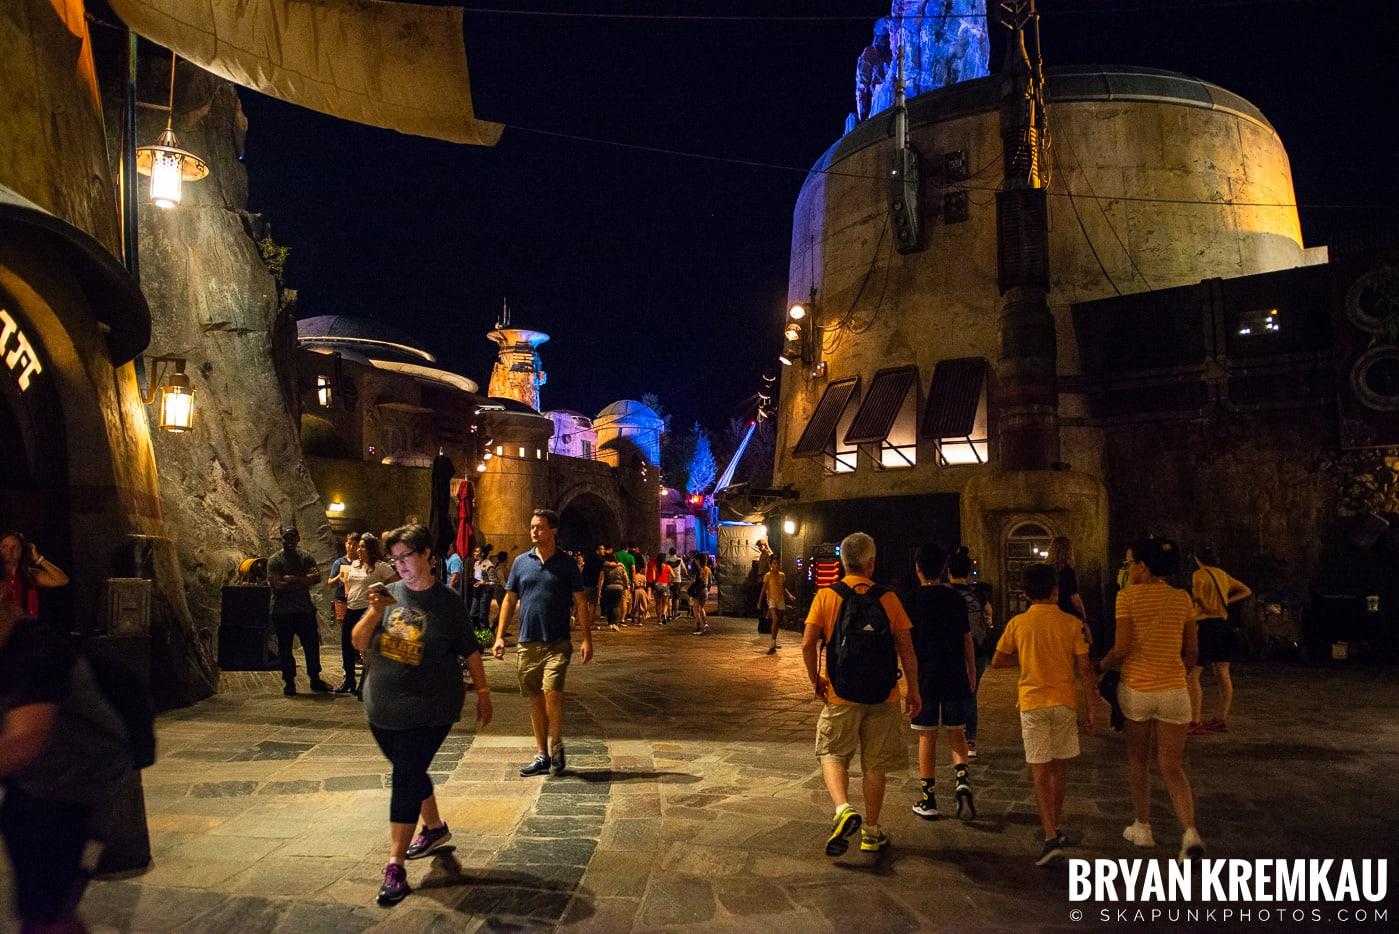 Walt Disney World Vacation: Day 5 (Animal Kingdom / Disney's Hollywood Studios) - 10.3.19 (13)